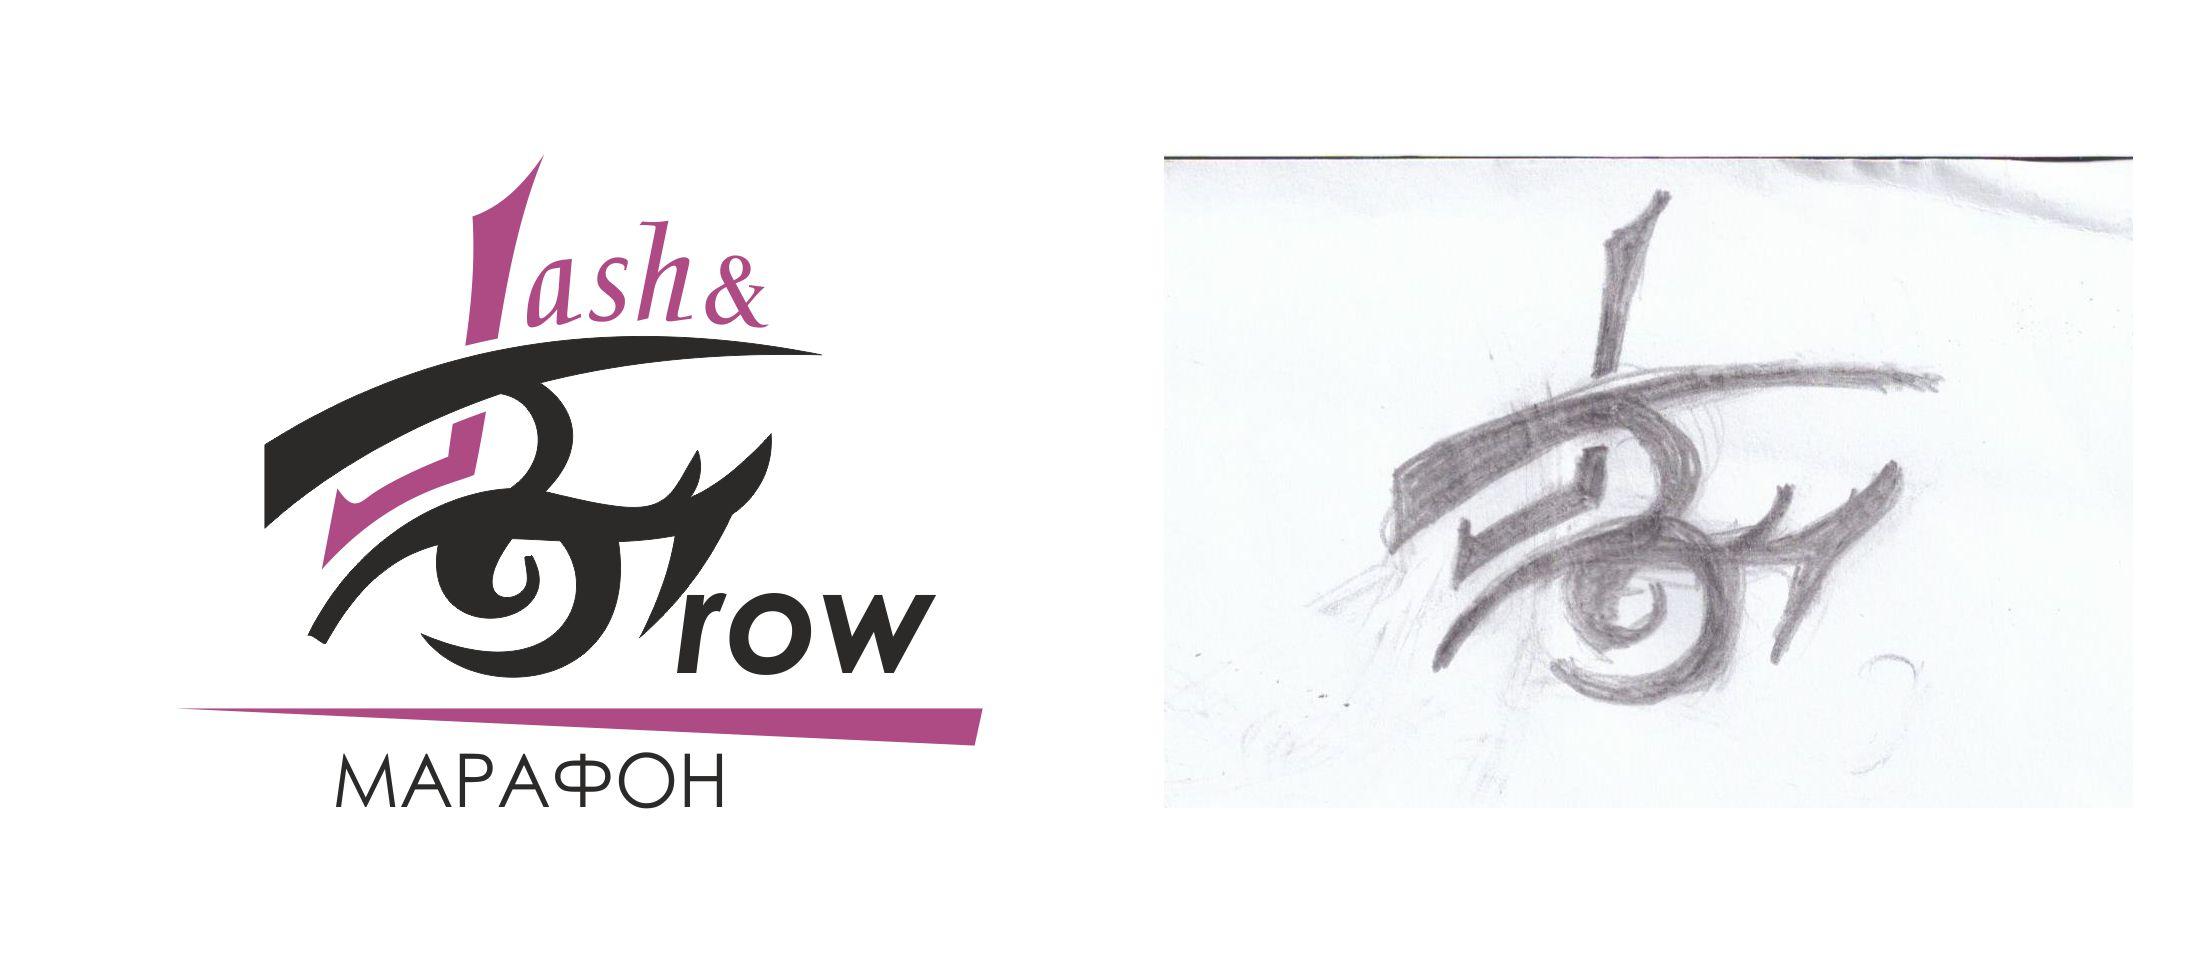 "Создание логотипа мероприятия ""Марафон Lash&Brow"" фото f_29558f9061ac66b7.jpg"